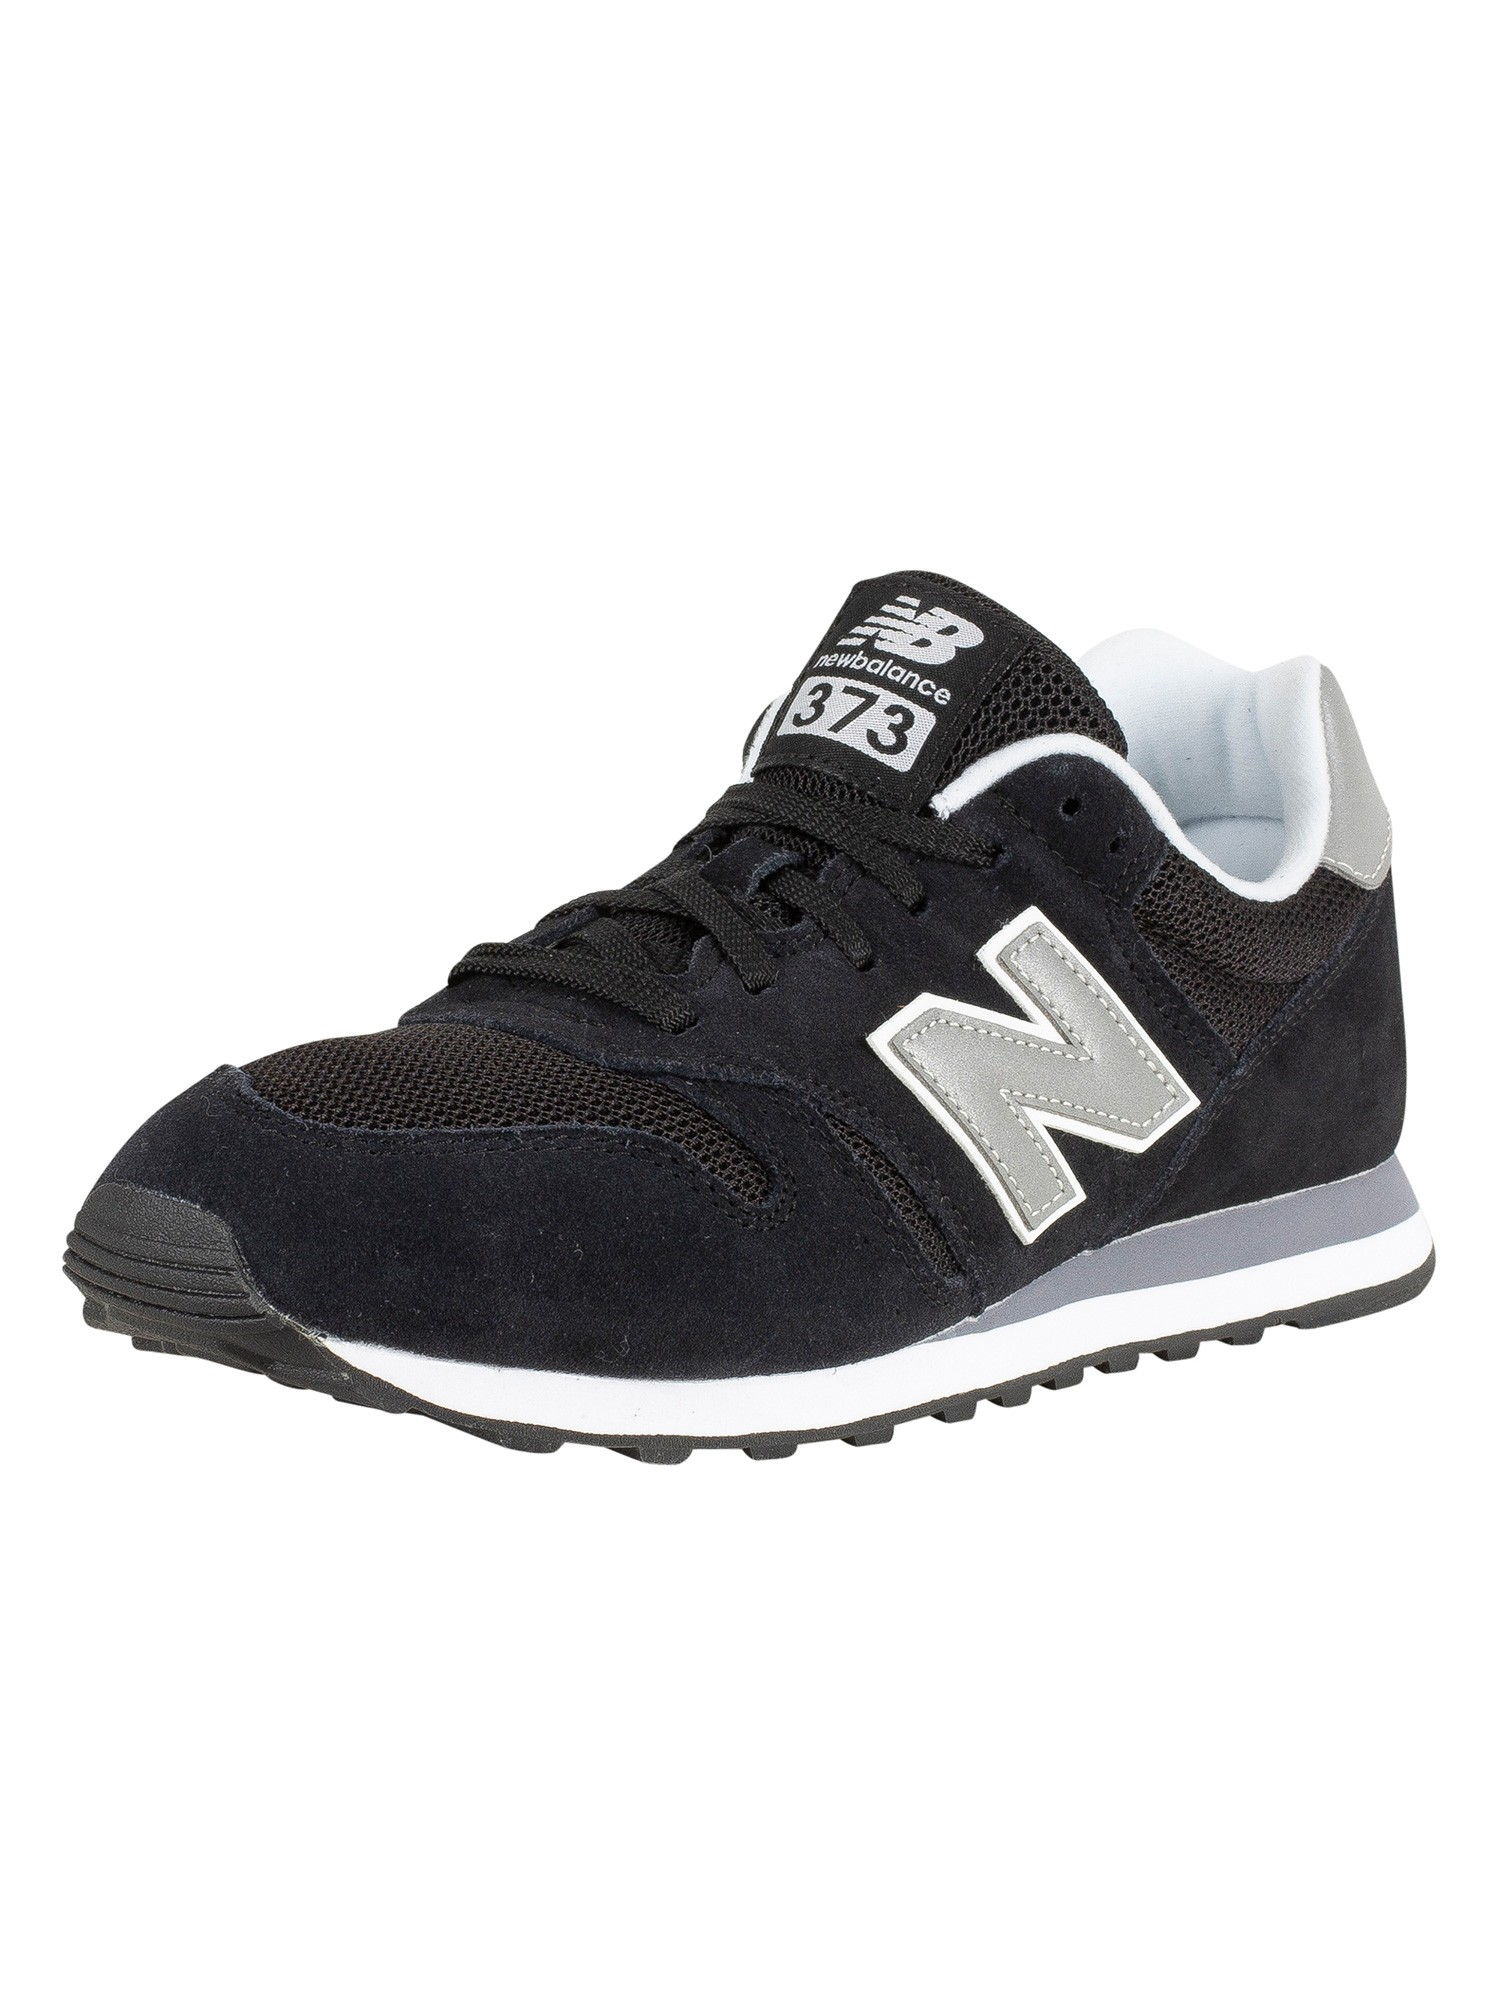 factory price 46cf8 cc5ab New Balance 373 Trainers - Black